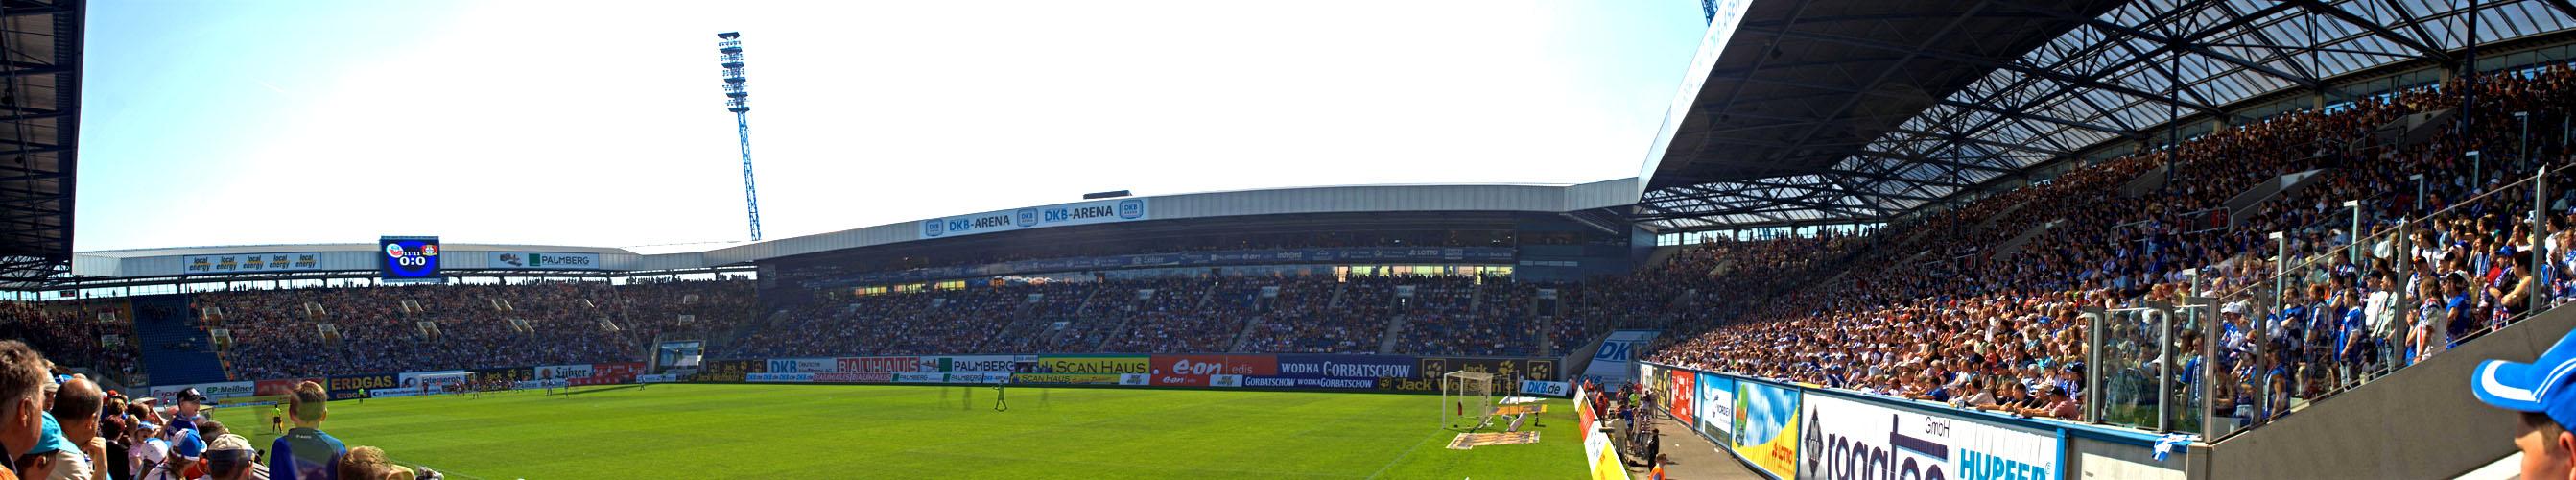 DKB-Arena